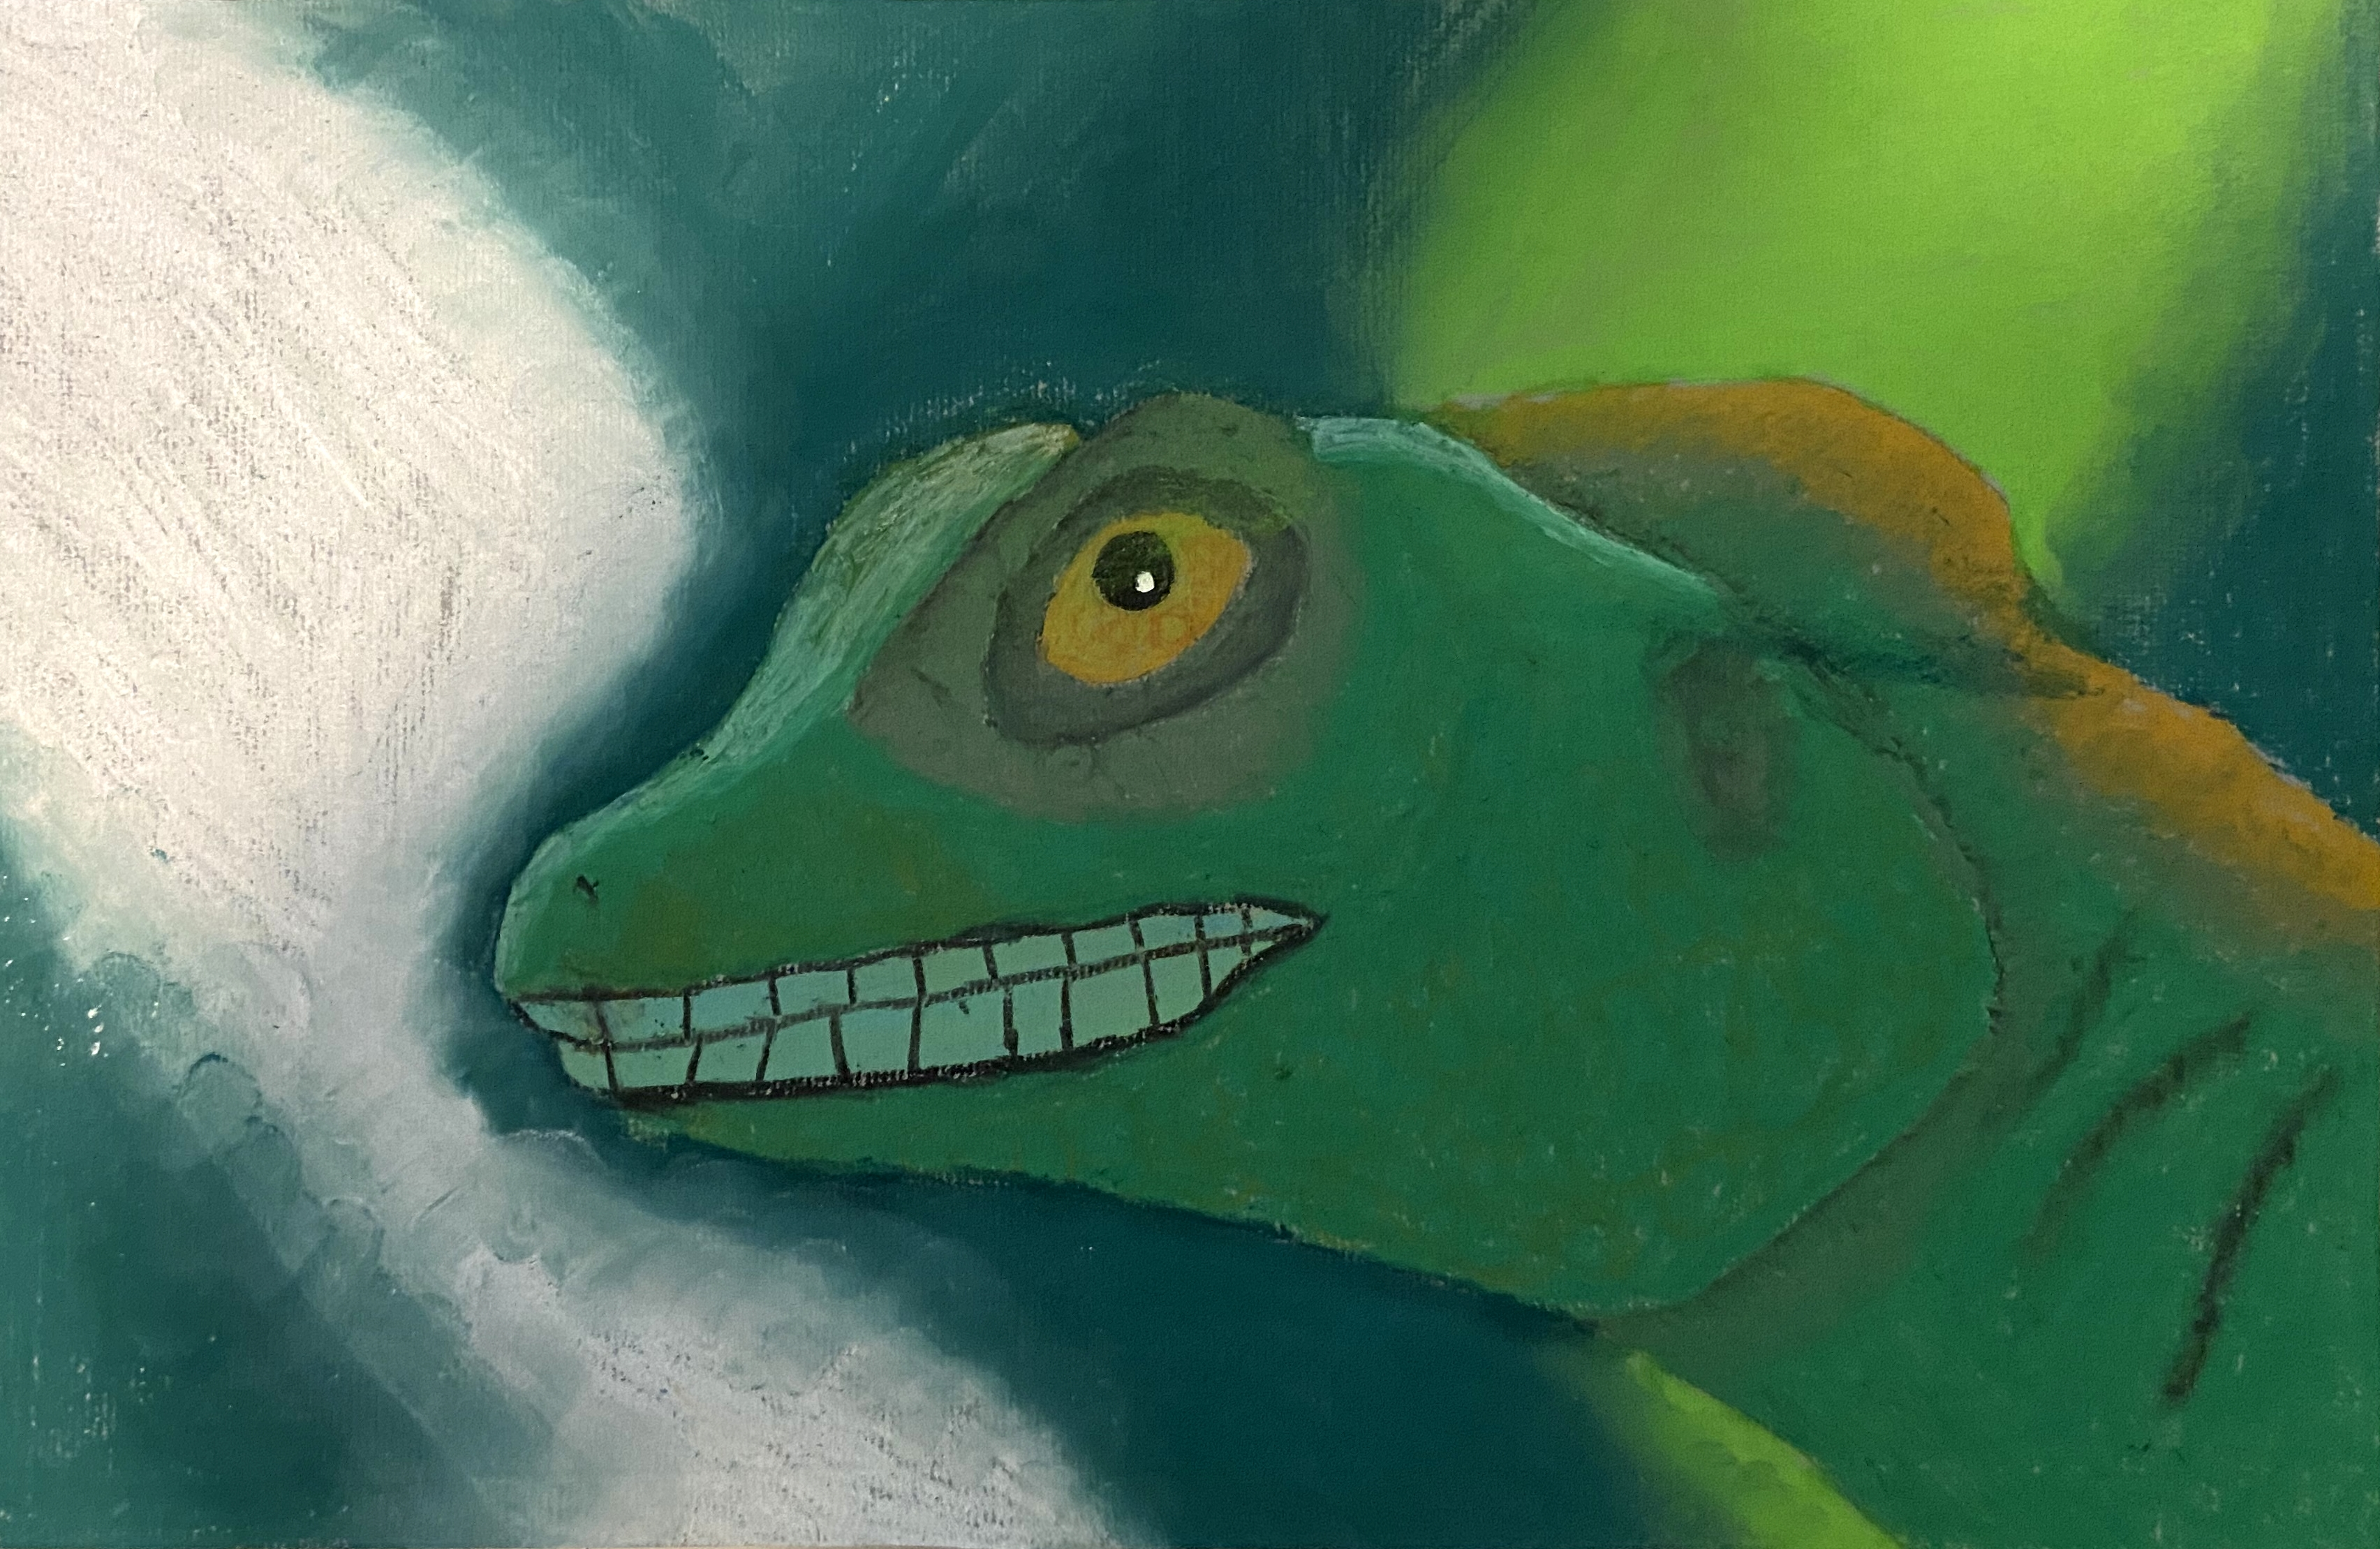 Phrog, the Socially Inept Lizard